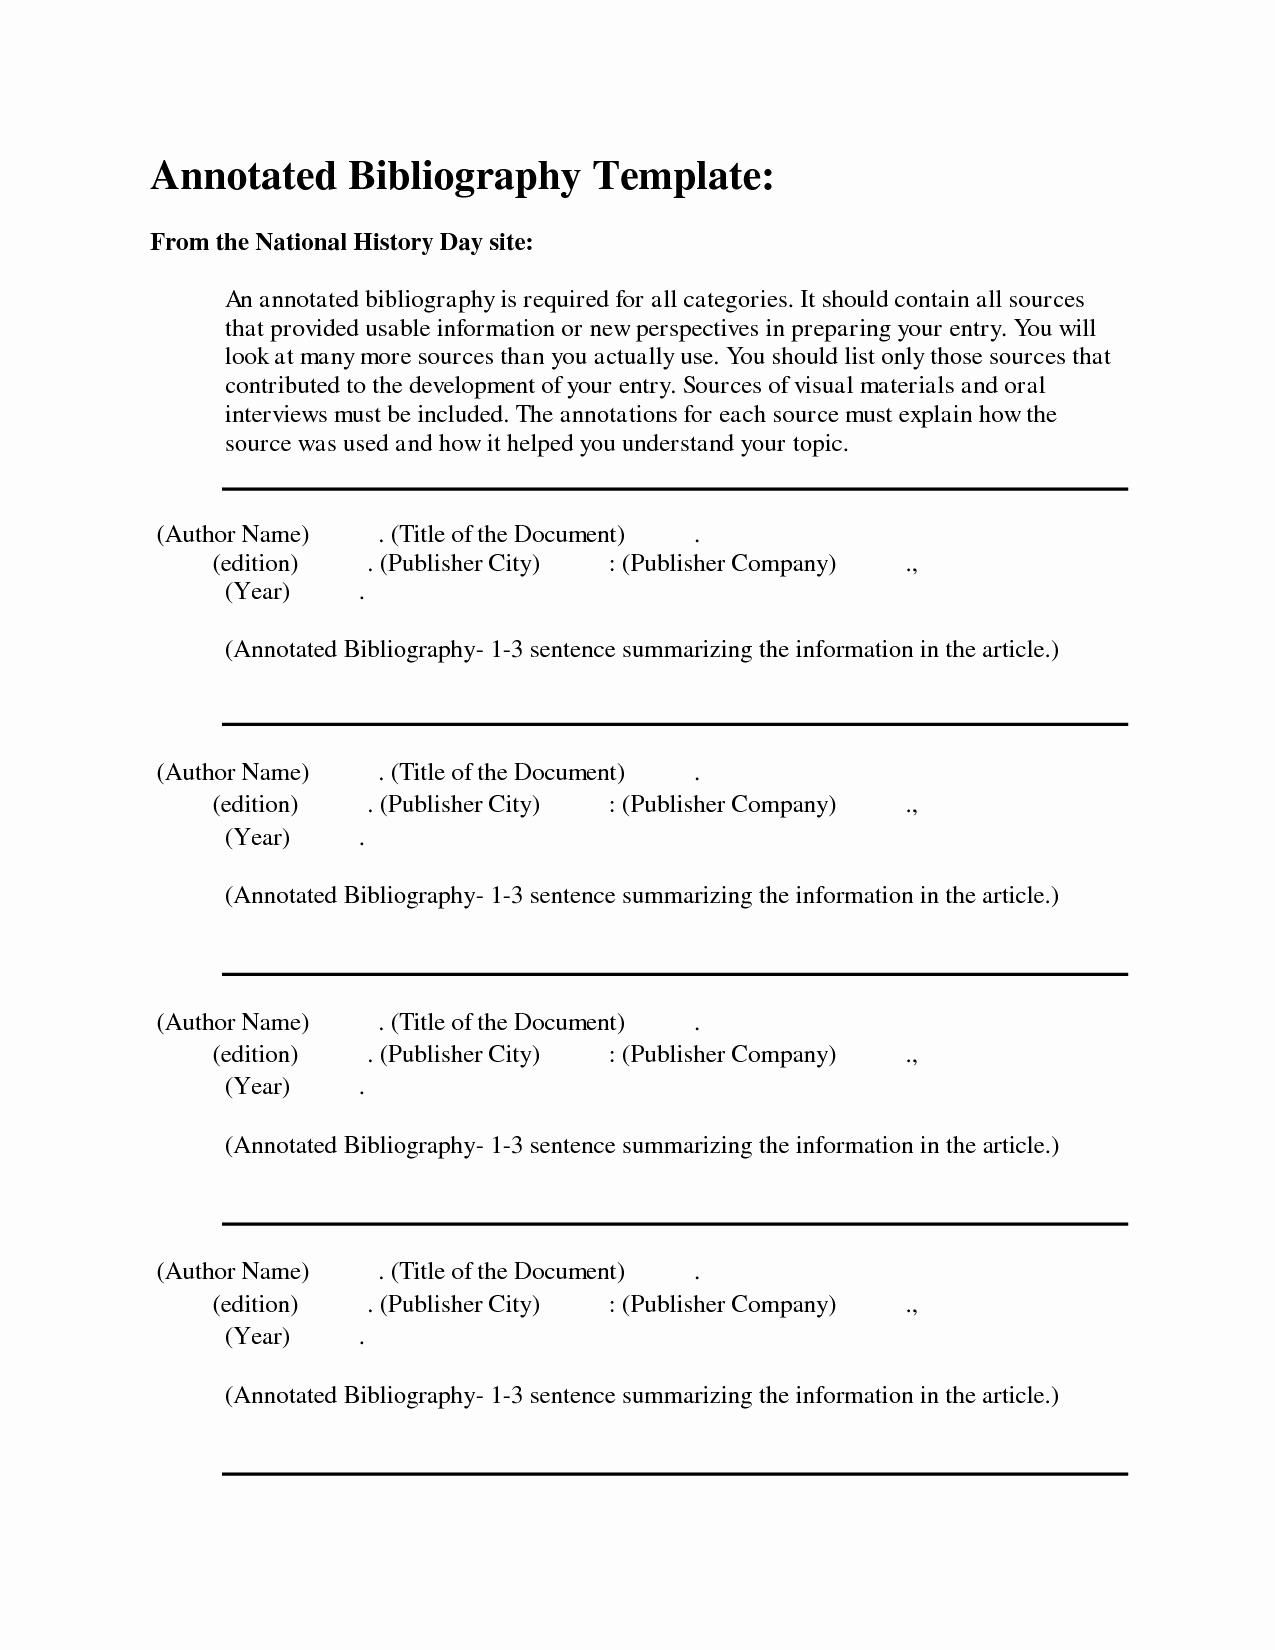 Free Apa format Template Inspirational Free Apa Annotated Bibliography Template